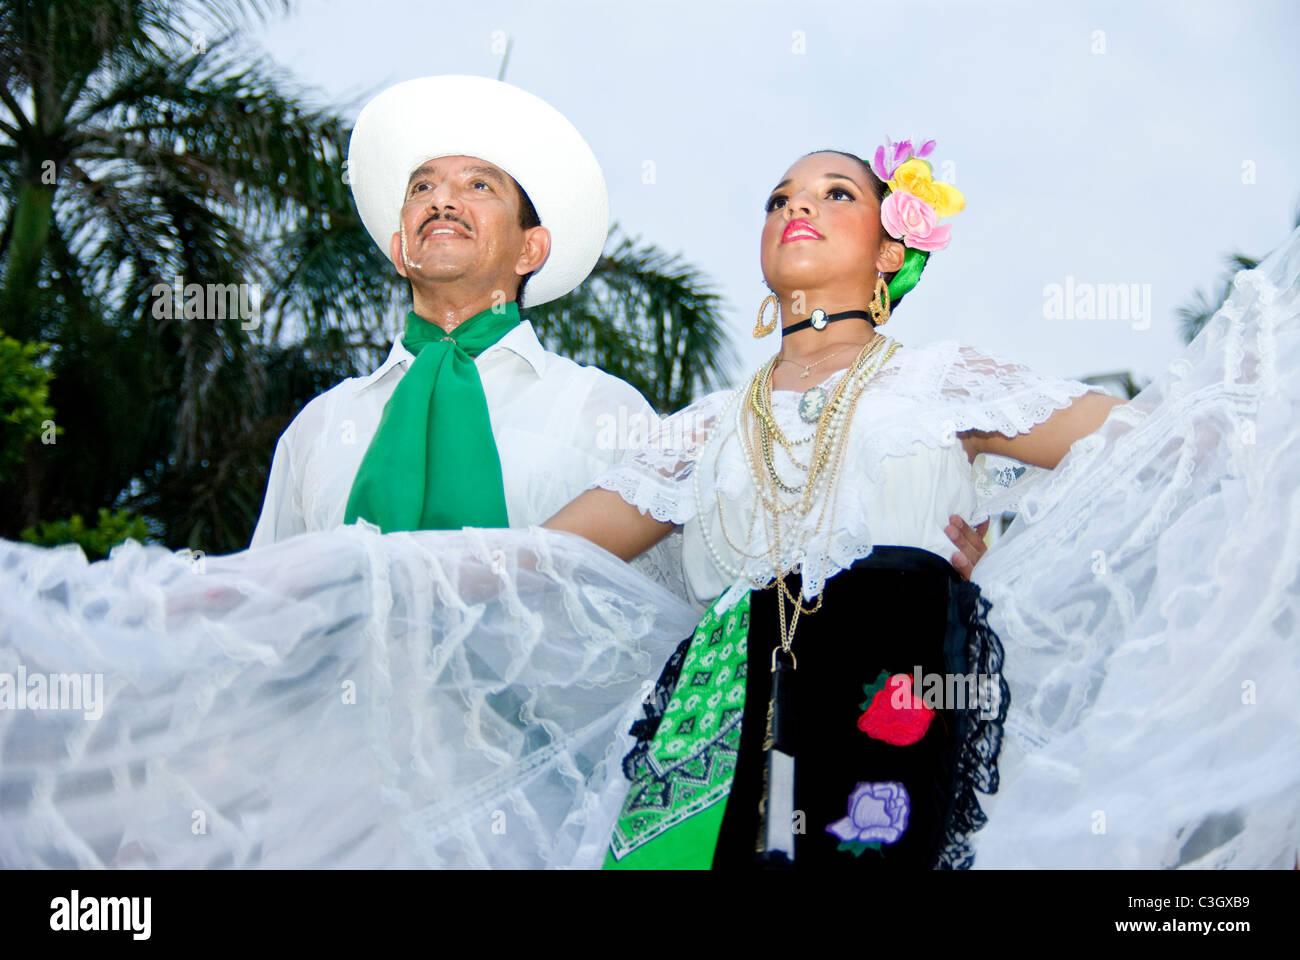 Mexico. Veracruz city. Mexican folk-dance exhibitions. 'Son Jarocho'. - Stock Image